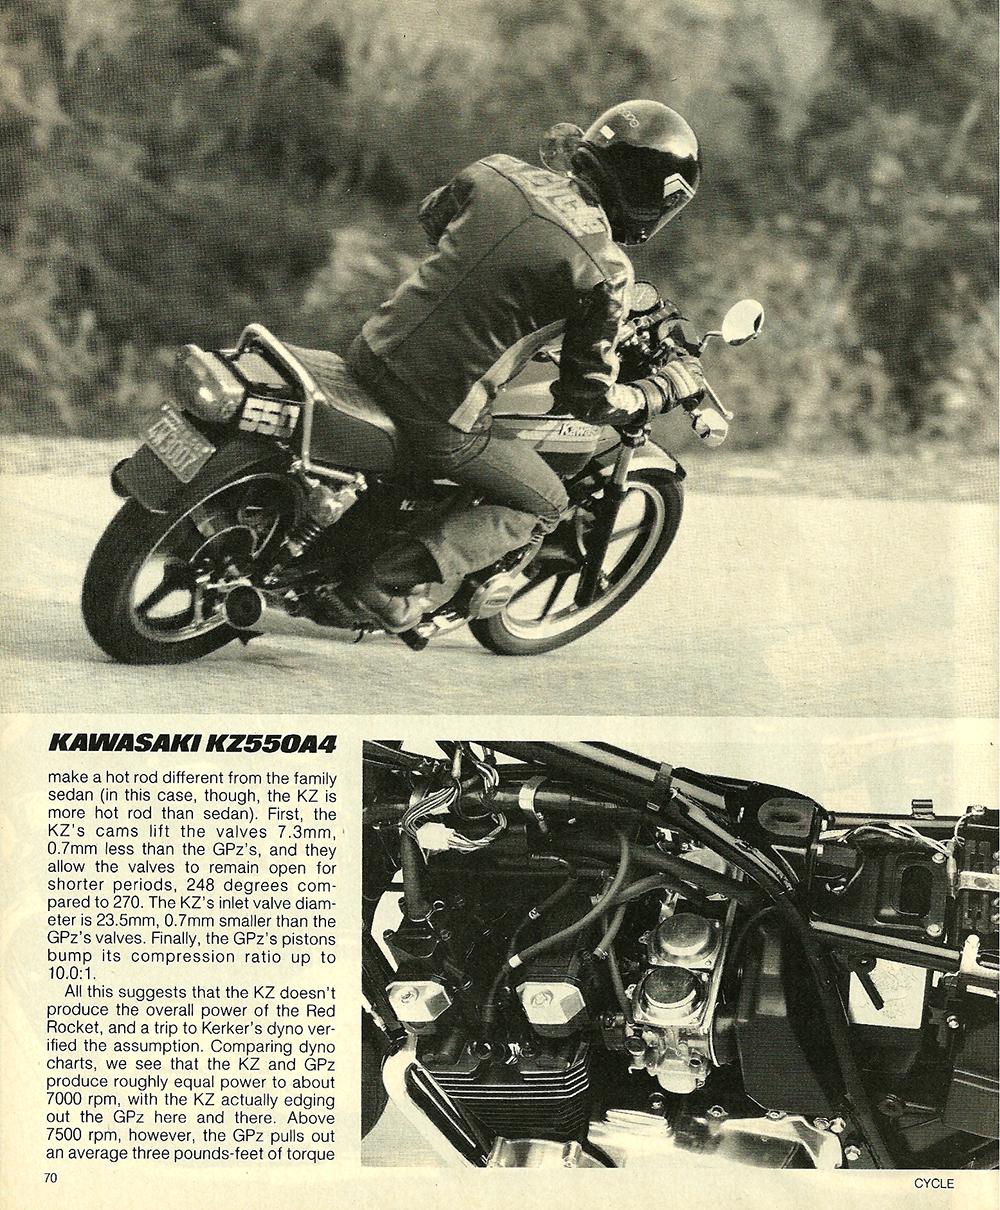 1983 Kawasaki KZ550 A4 road test 6.jpg